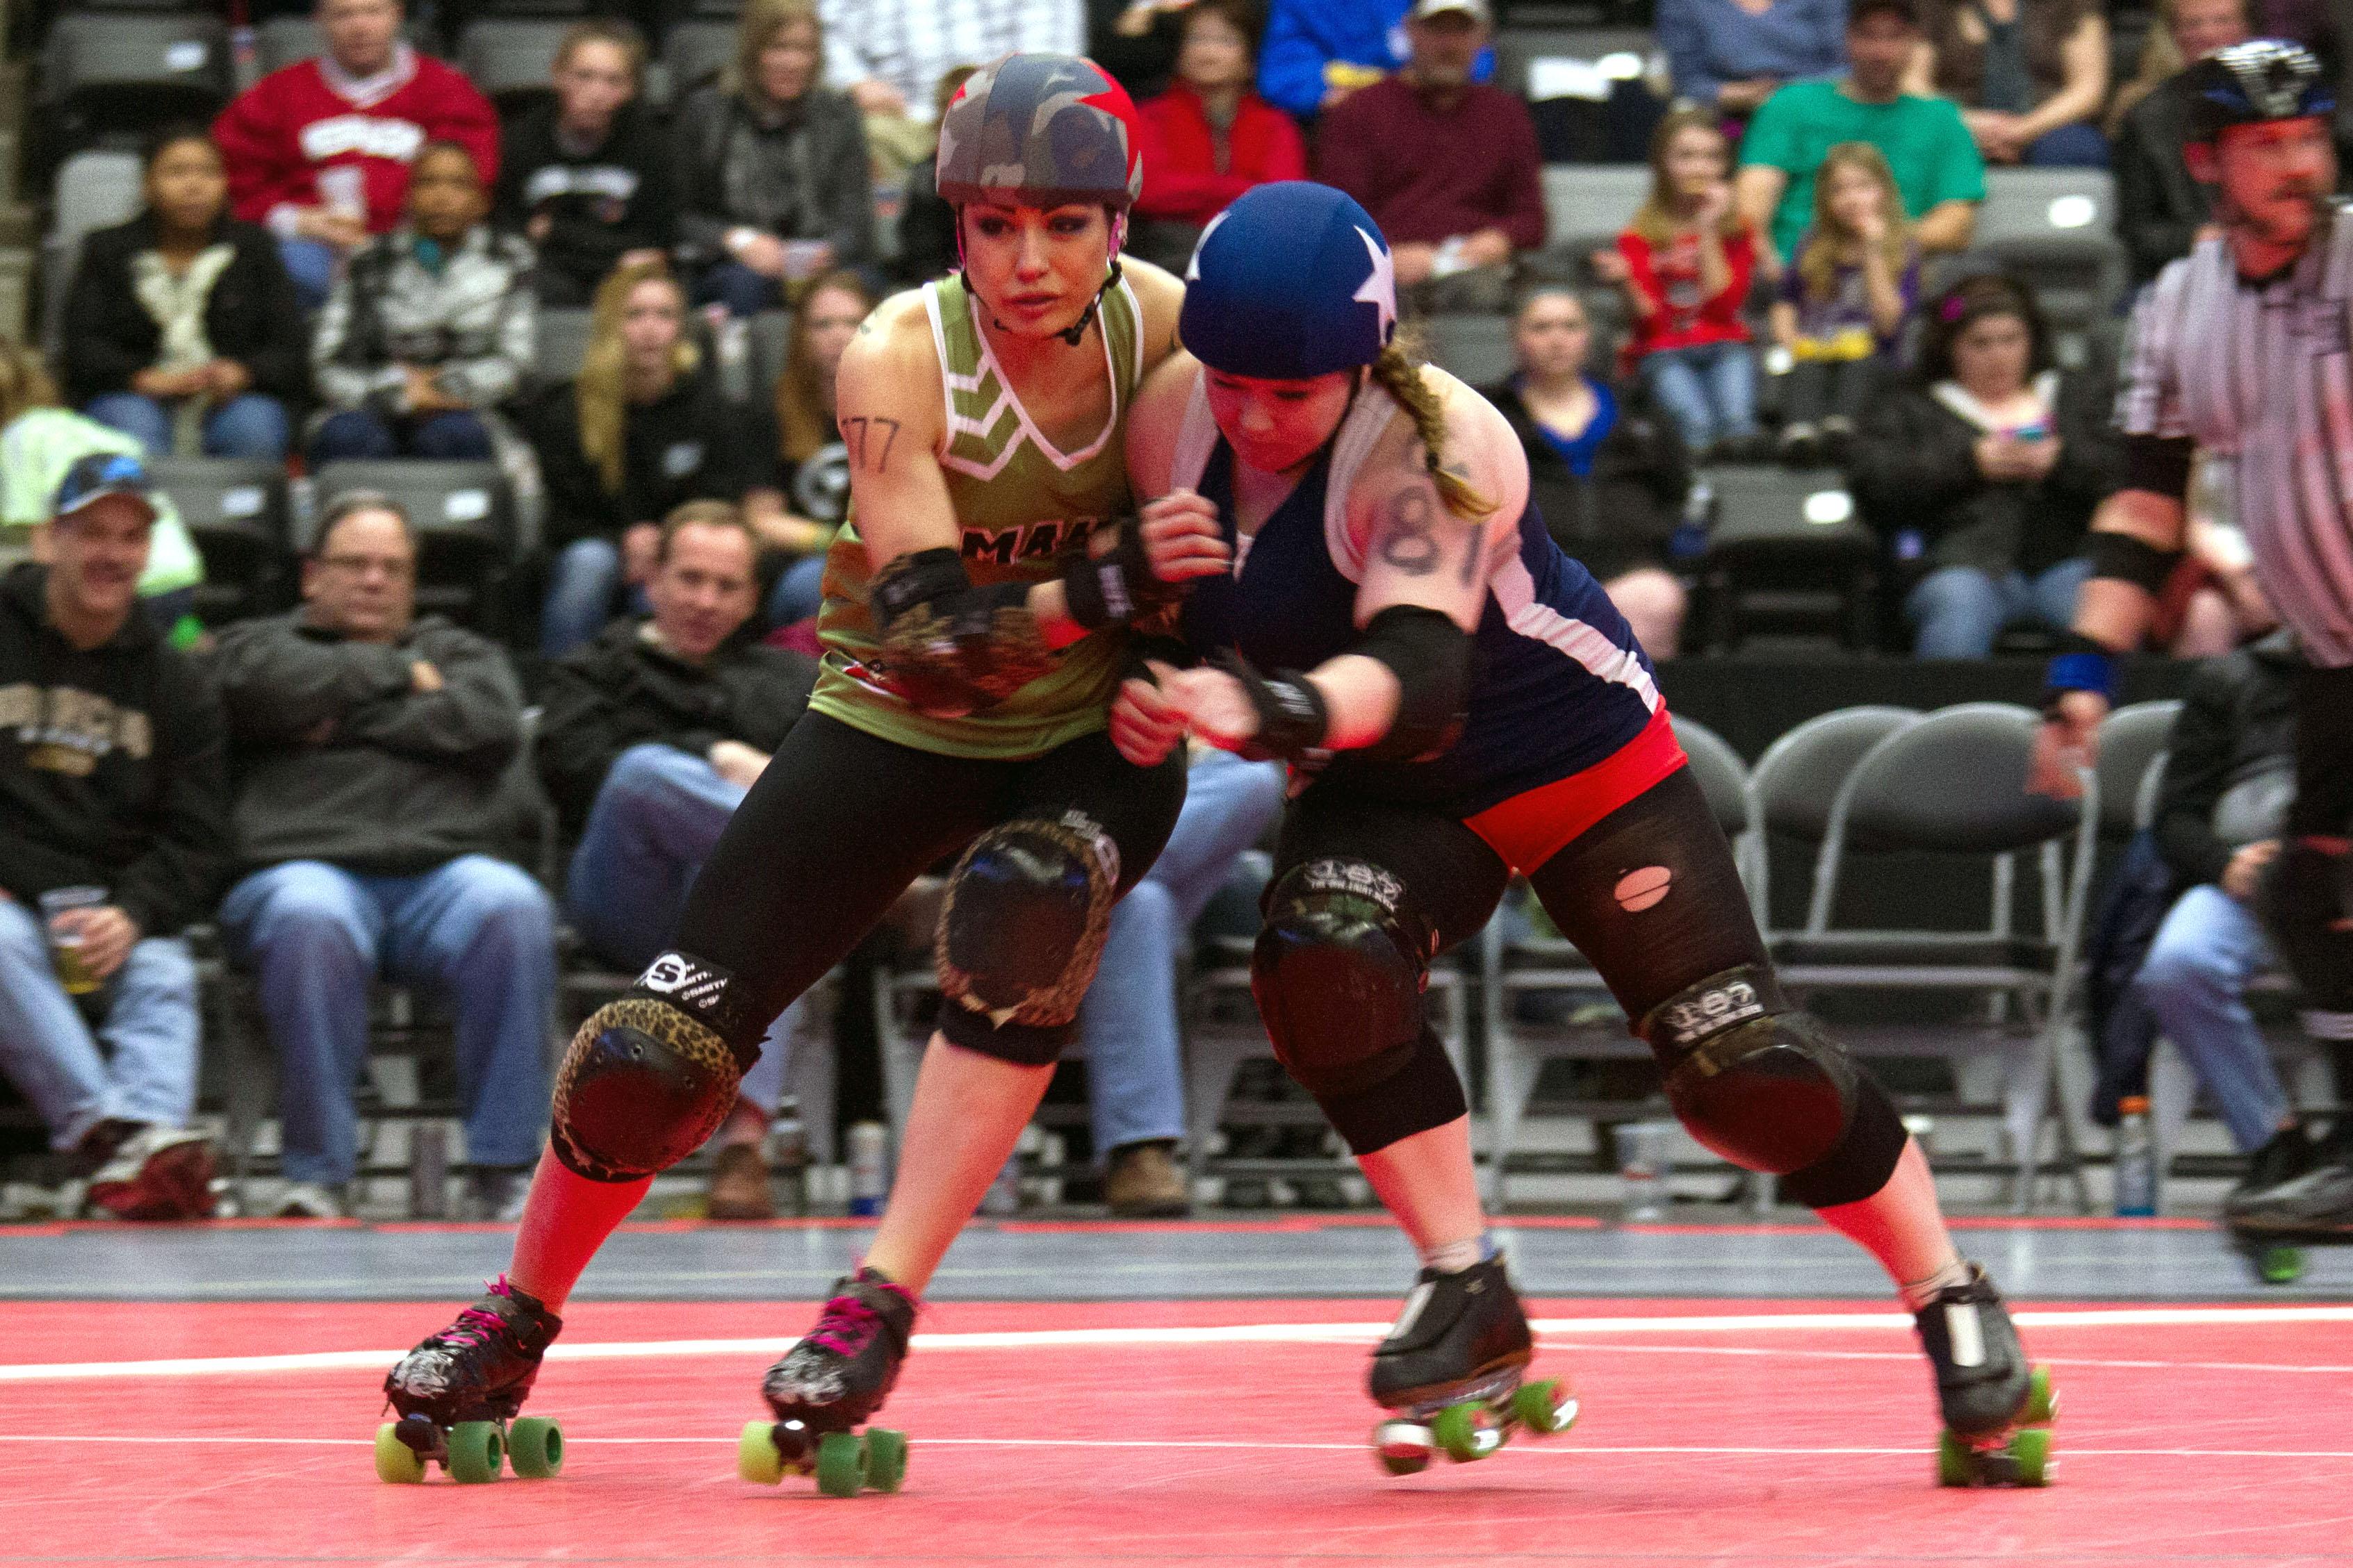 Roller skating omaha - Omaha Wins 2013 Season Opener